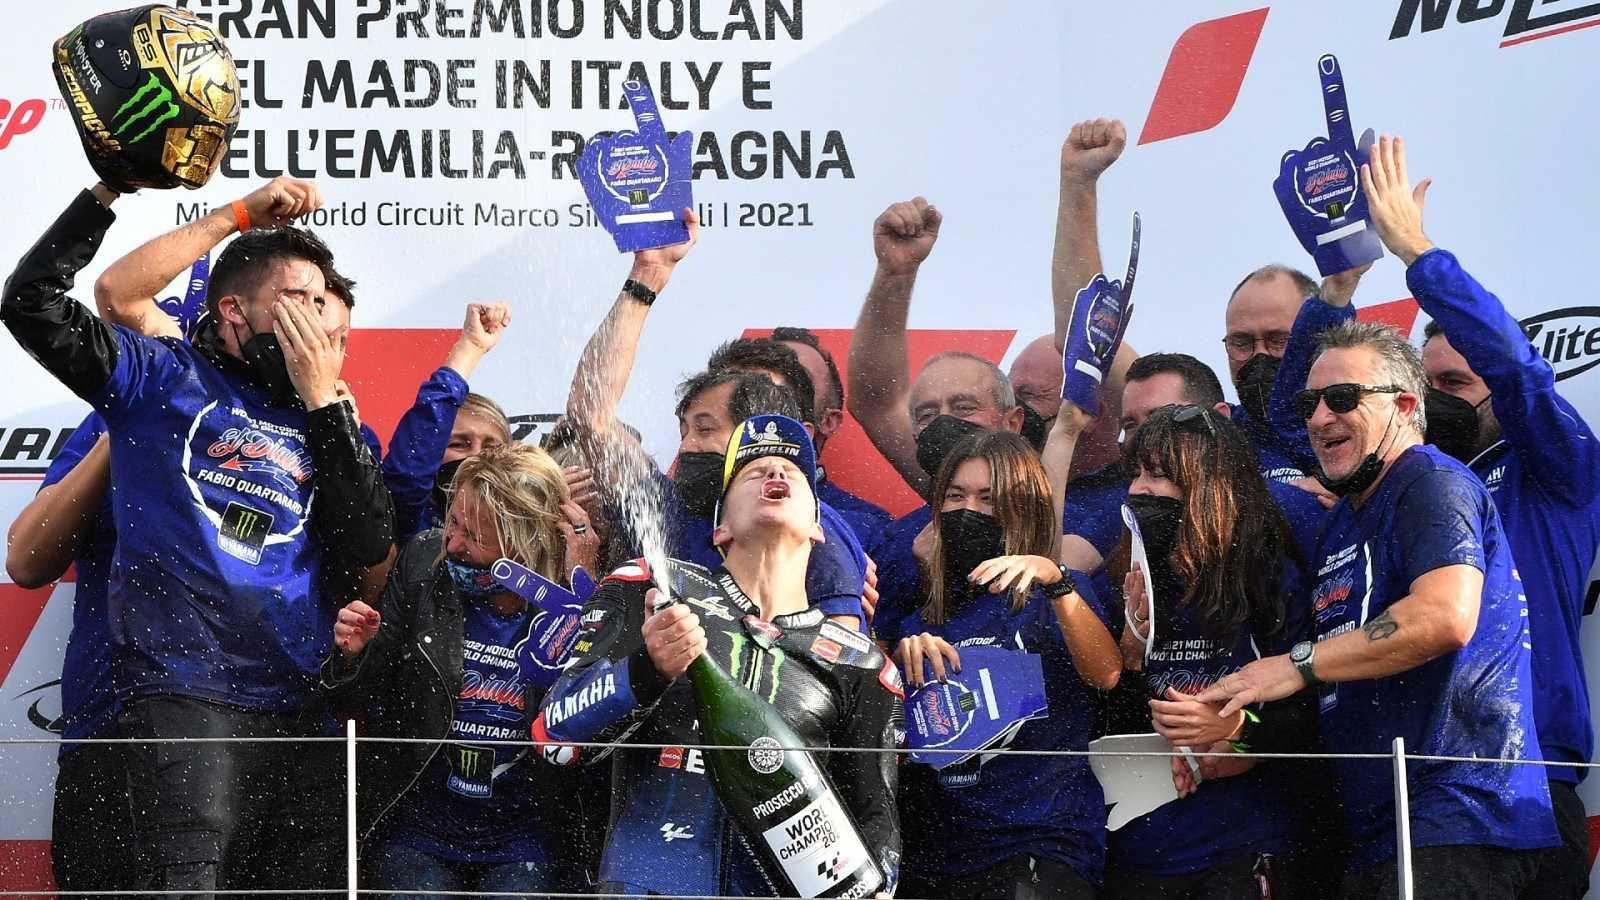 Fabio Quartararo conquista MotoGP en el circuito de Emilia-Romaña